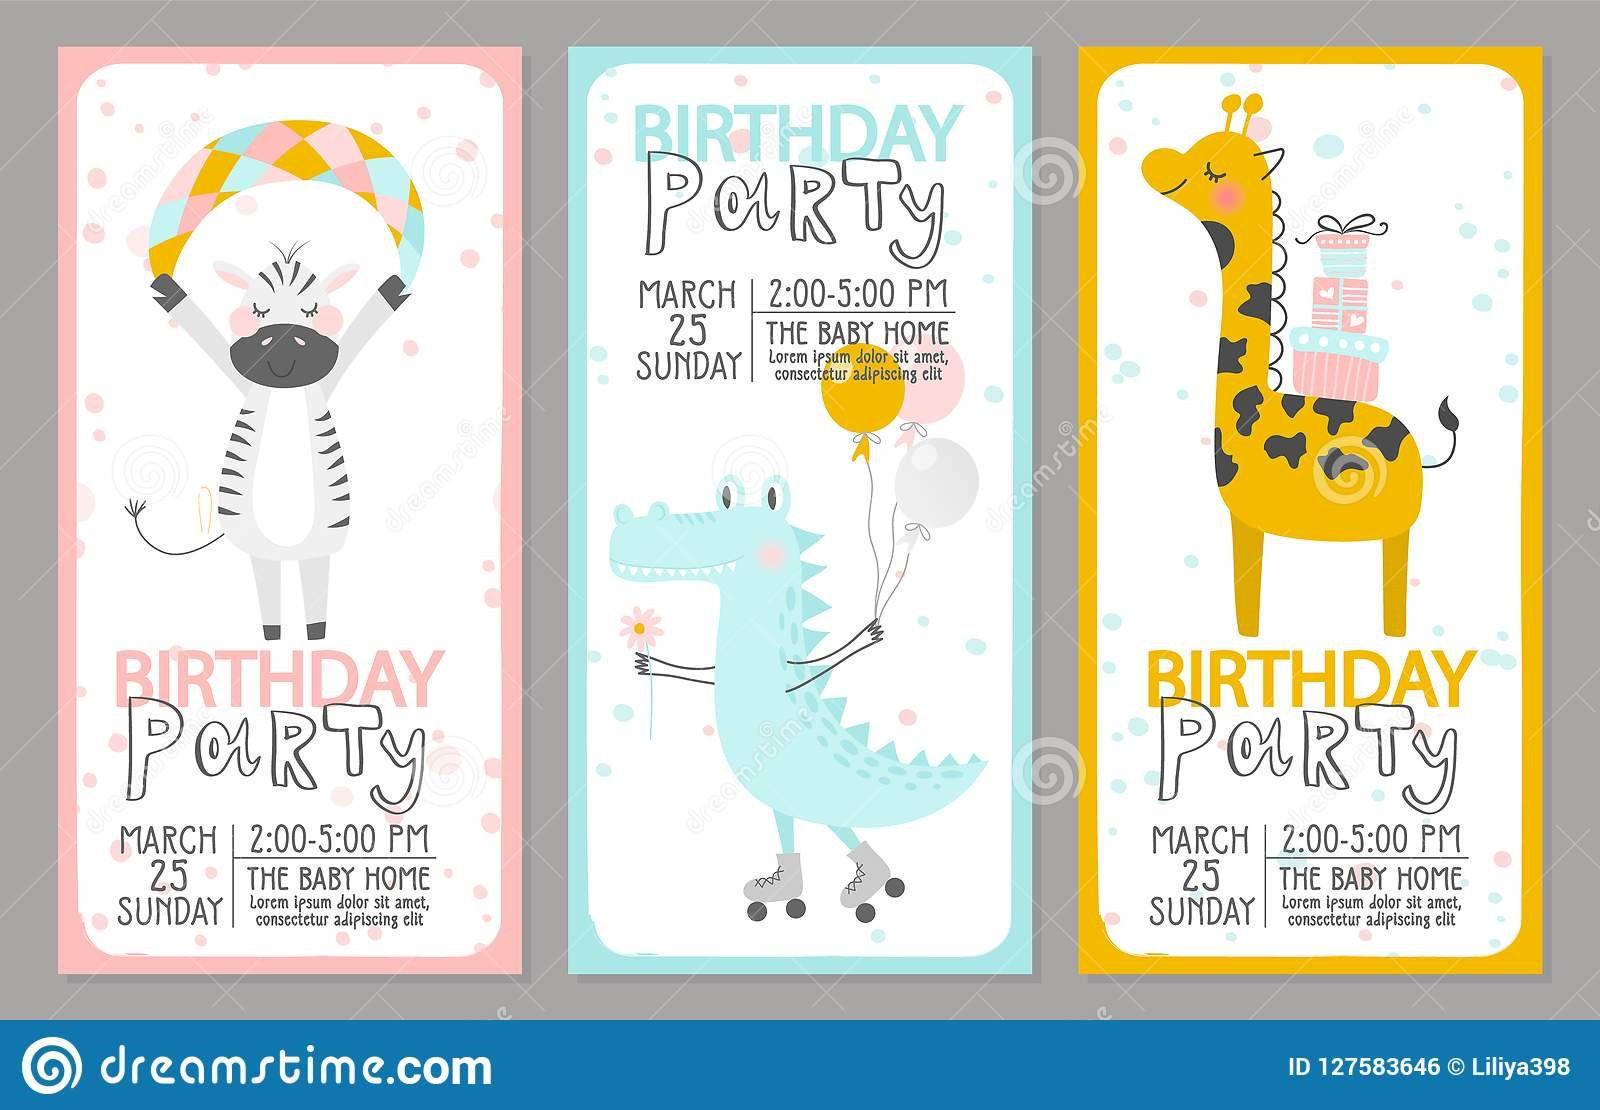 008 Striking Free Birthday Party Invitation Template Photo  Templates Printable 16th Australia UkFull